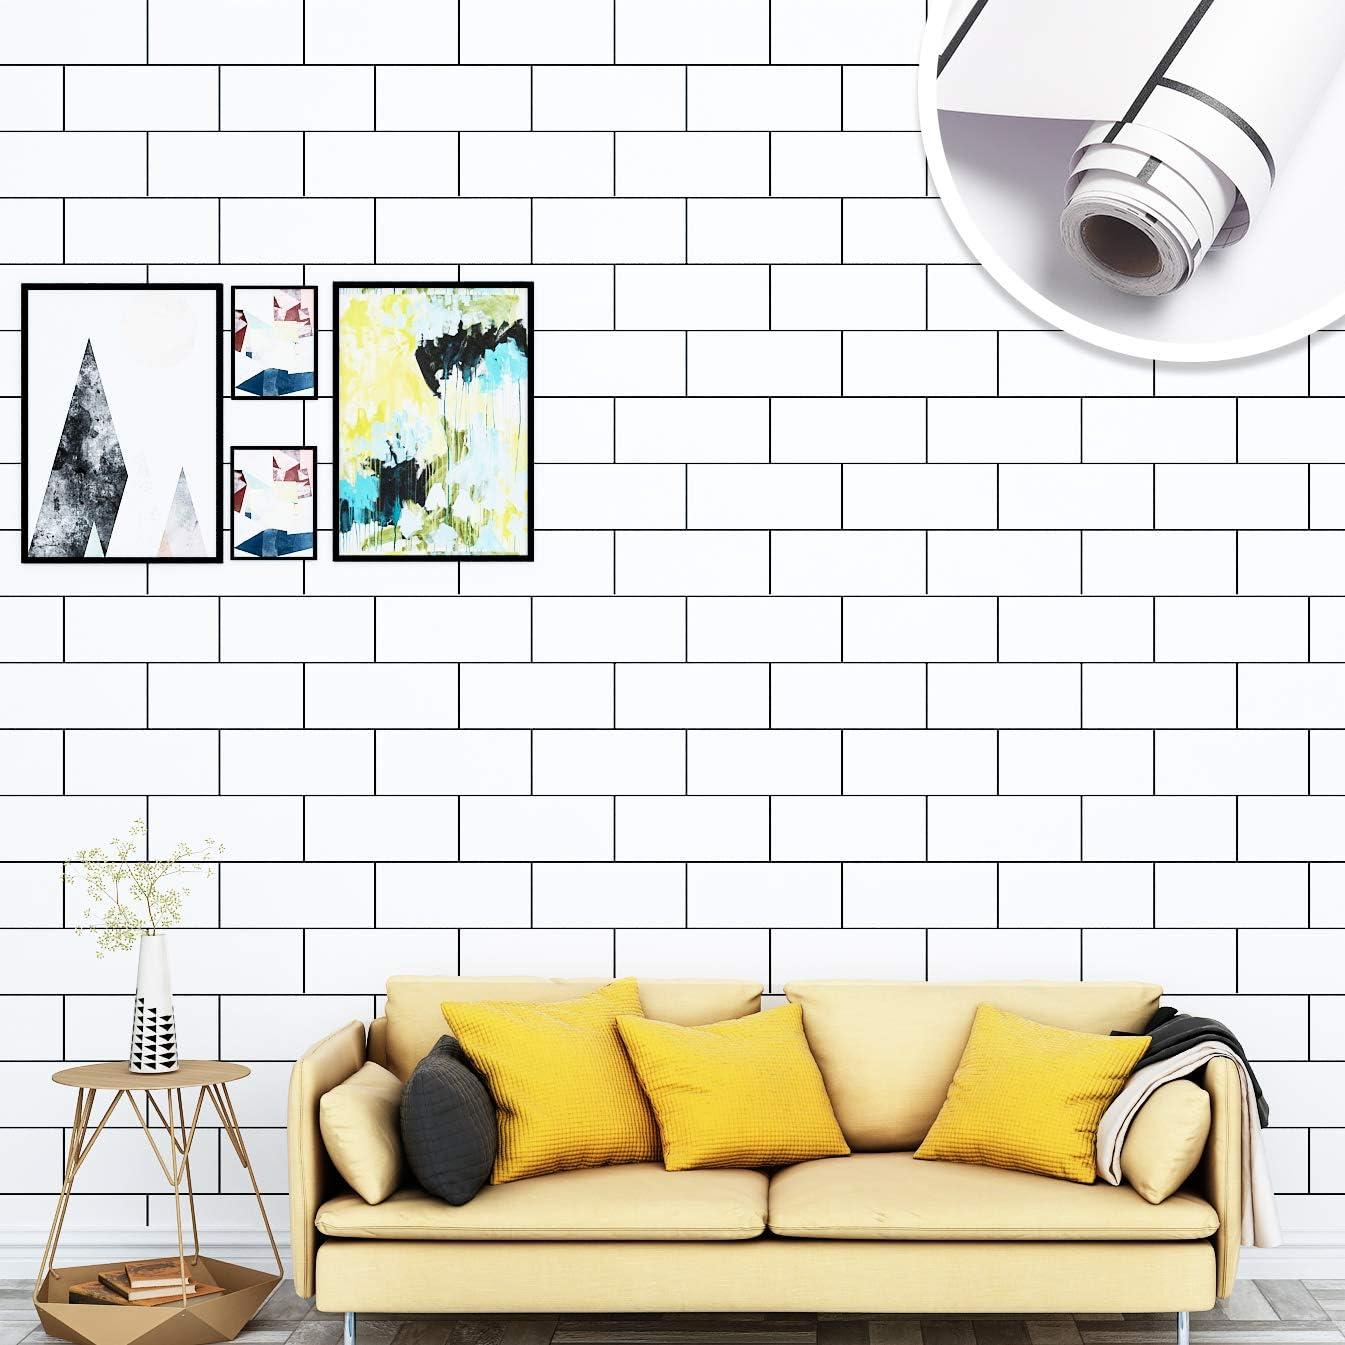 Yenhome 24 X 118 White Matt Self Adhesive Waterproof Vinyl Wall Paper For Kitchen Backsplash Peel And Stick Wallpaper For Bedroom Living Room Removable Wallpaper For Bathroom Wall Decor Amazon Com